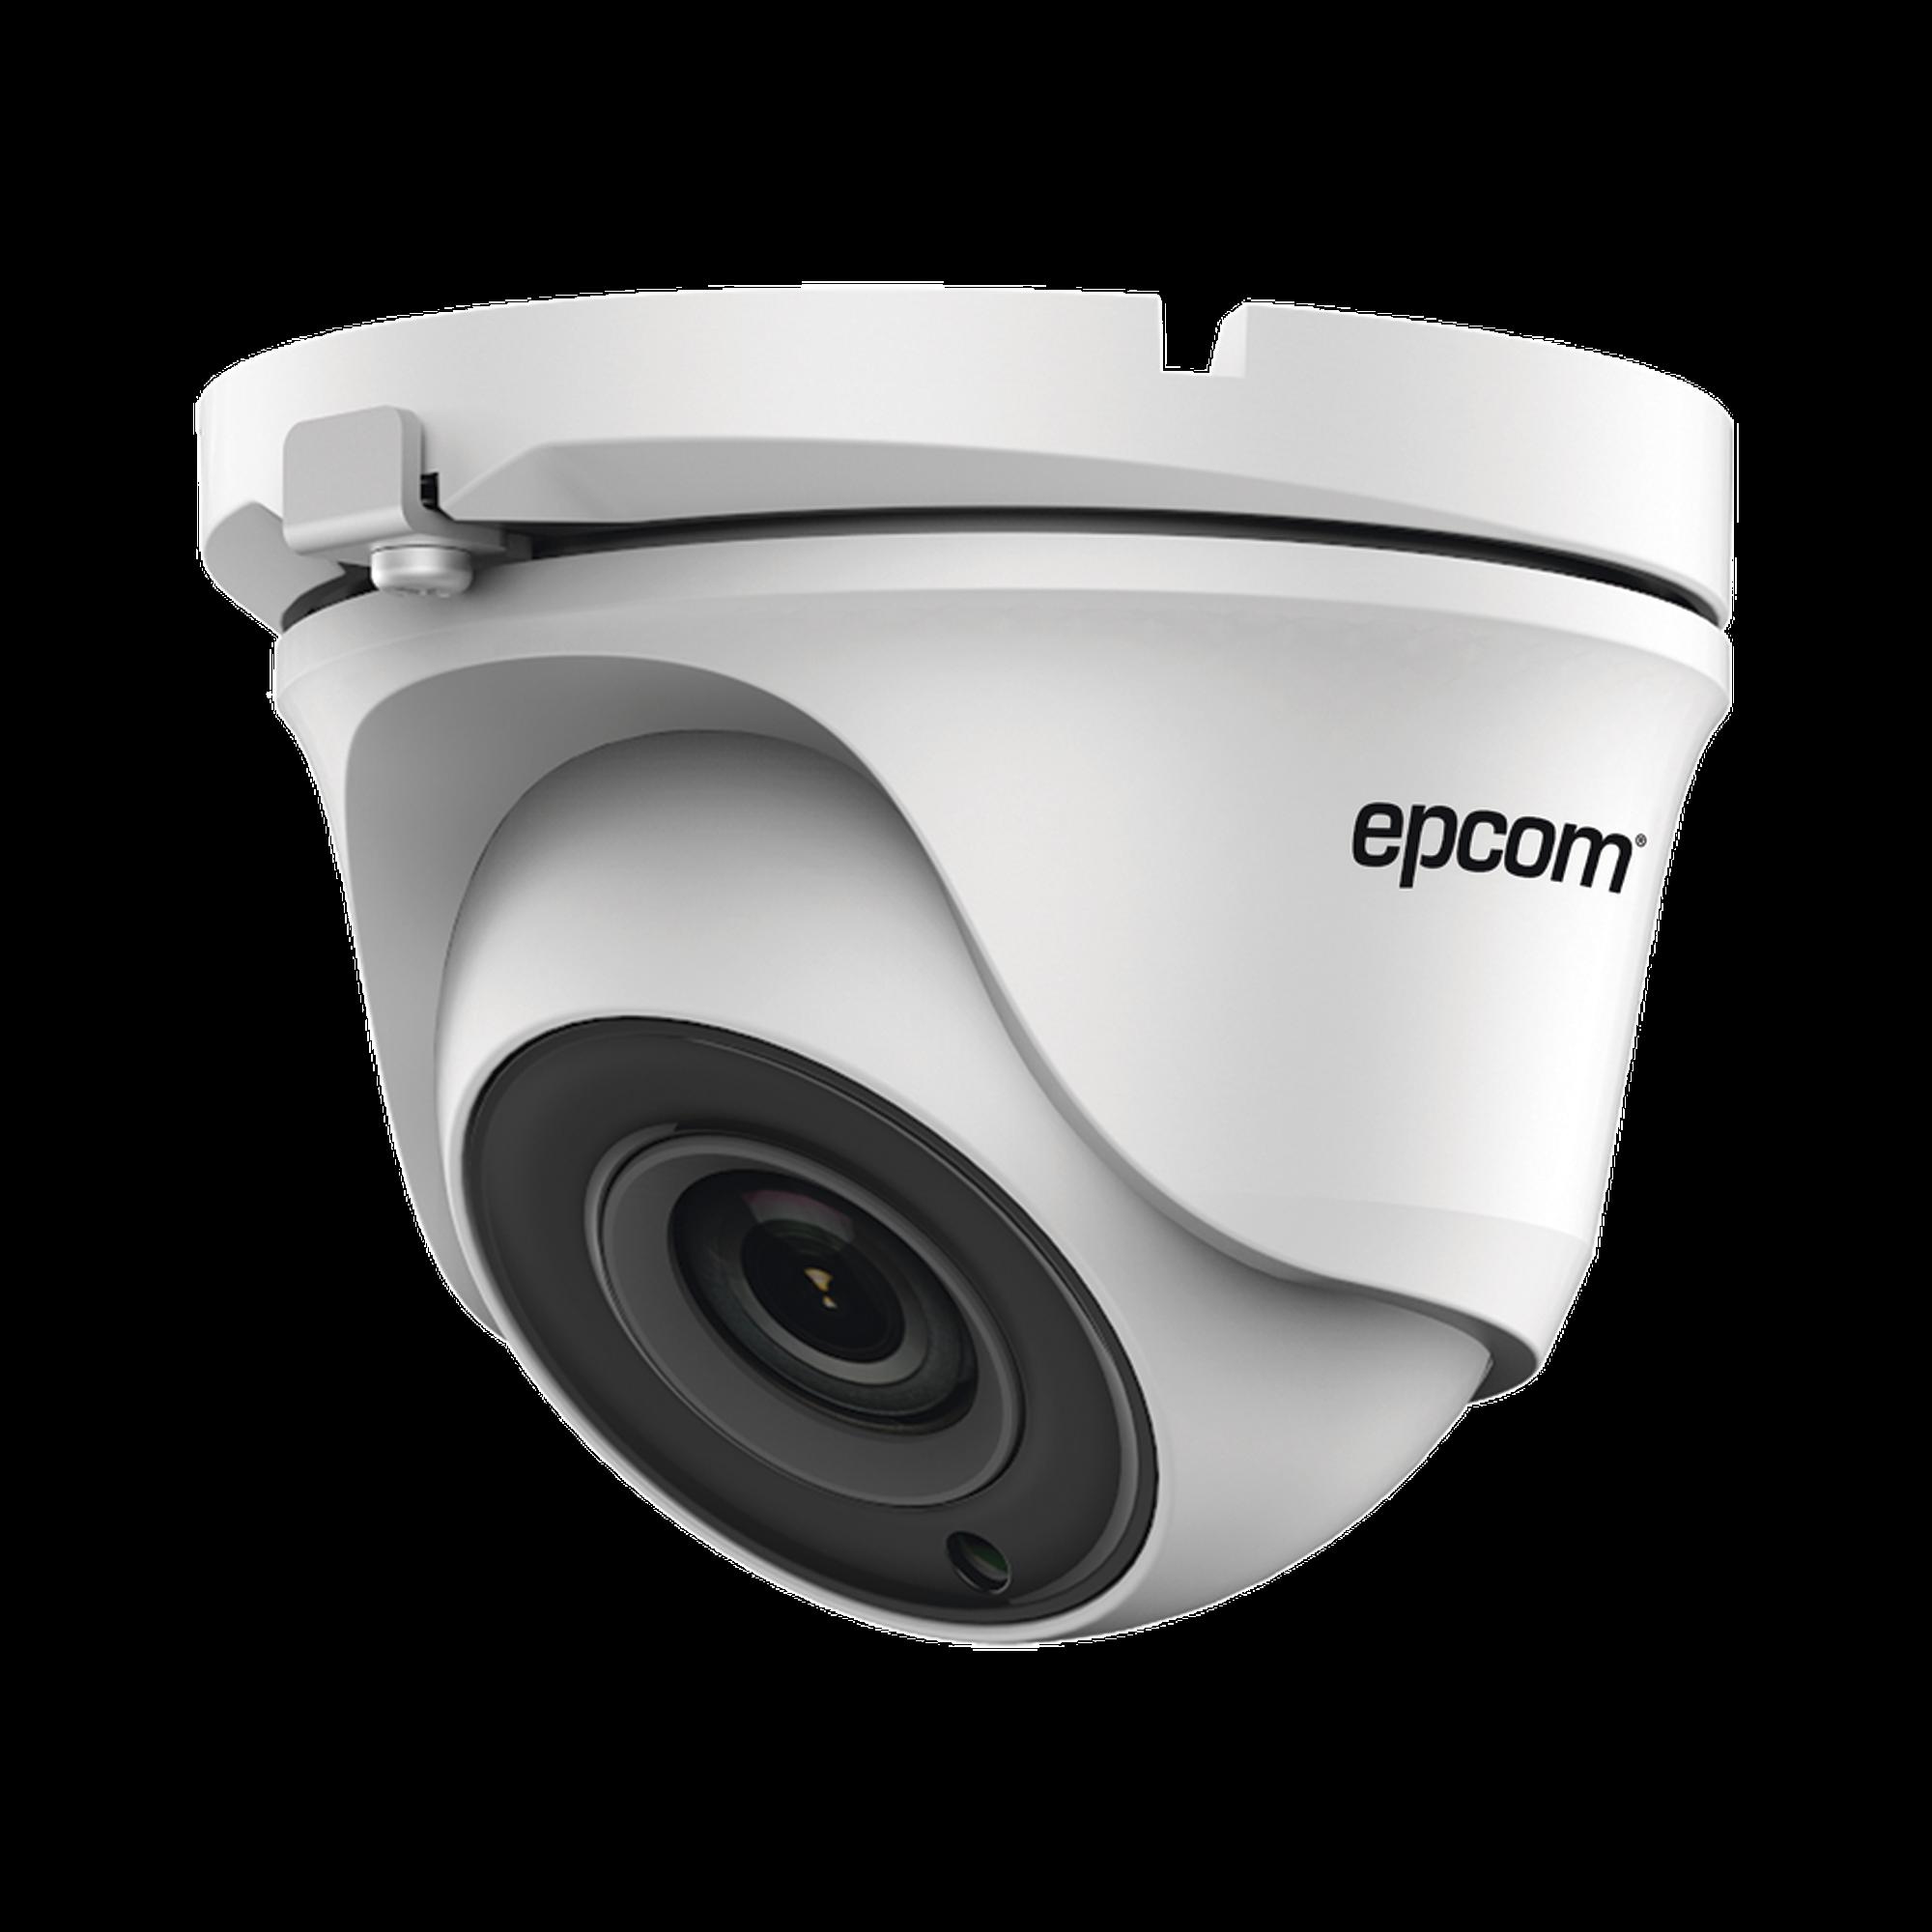 Eyeball TURBOHD 720p / METALICA / Gran Angular 92? / Lente 2.8 mm / IR Inteligente 20 mts / Exterior IP66 / TVI-AHD-CVI-CVBS / dWDR